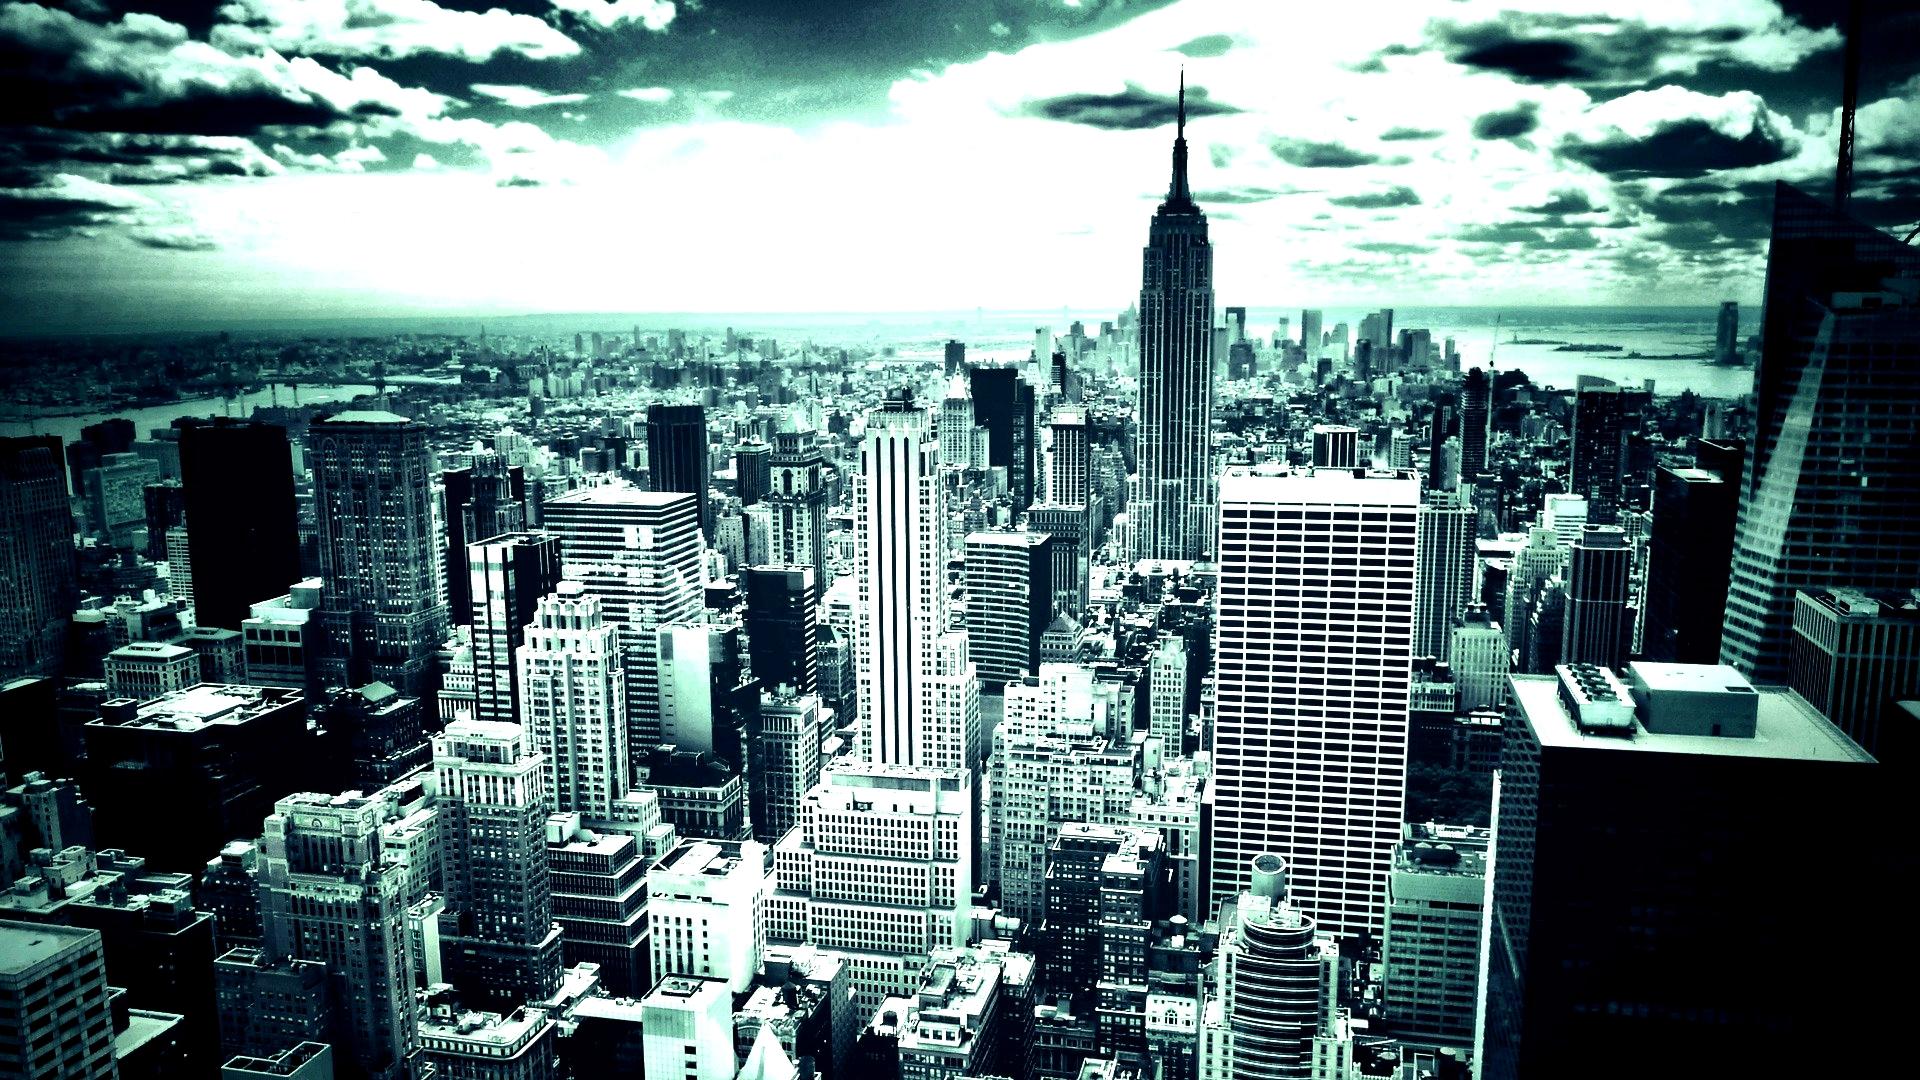 Cityscape-wallpaper-wp3803815